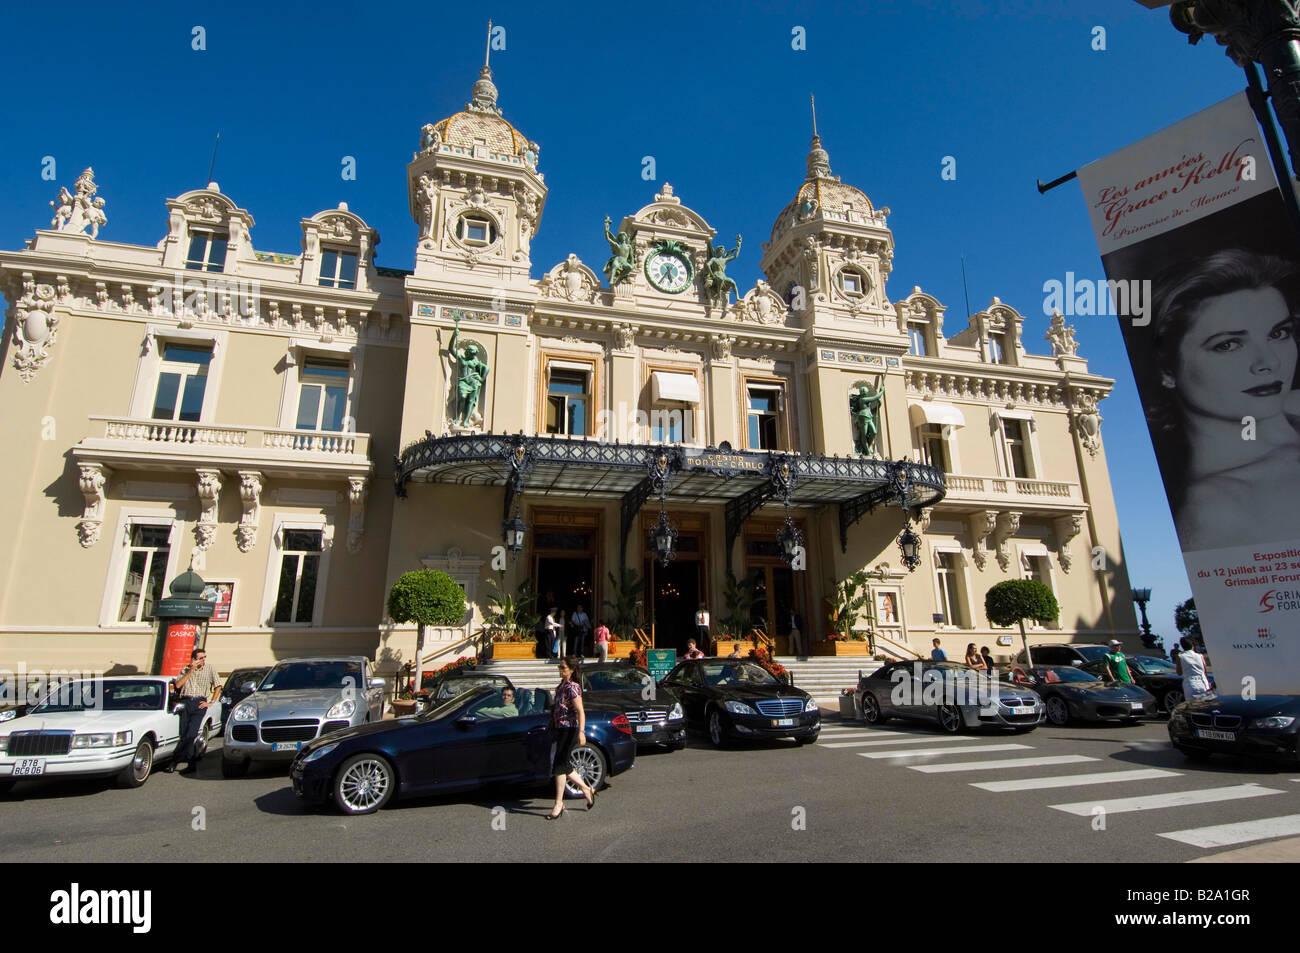 Principality of Monaco The Casino Date 12 02 2008 Ref WP B726 110139 0051 COMPULSORY CREDIT World Pictures Photoshot - Stock Image